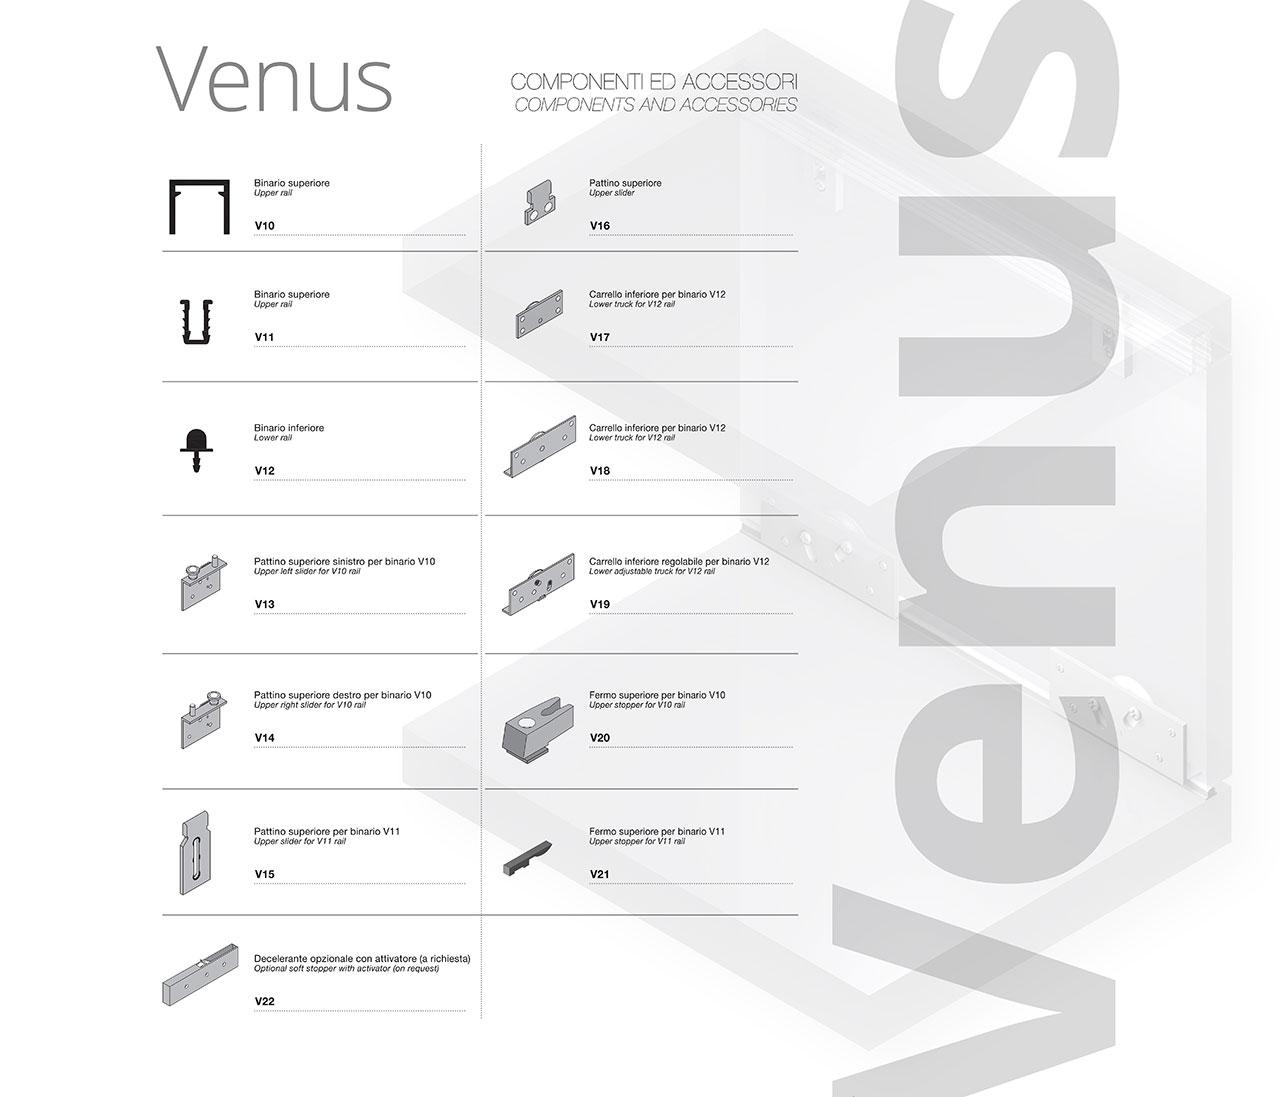 venus-105x90